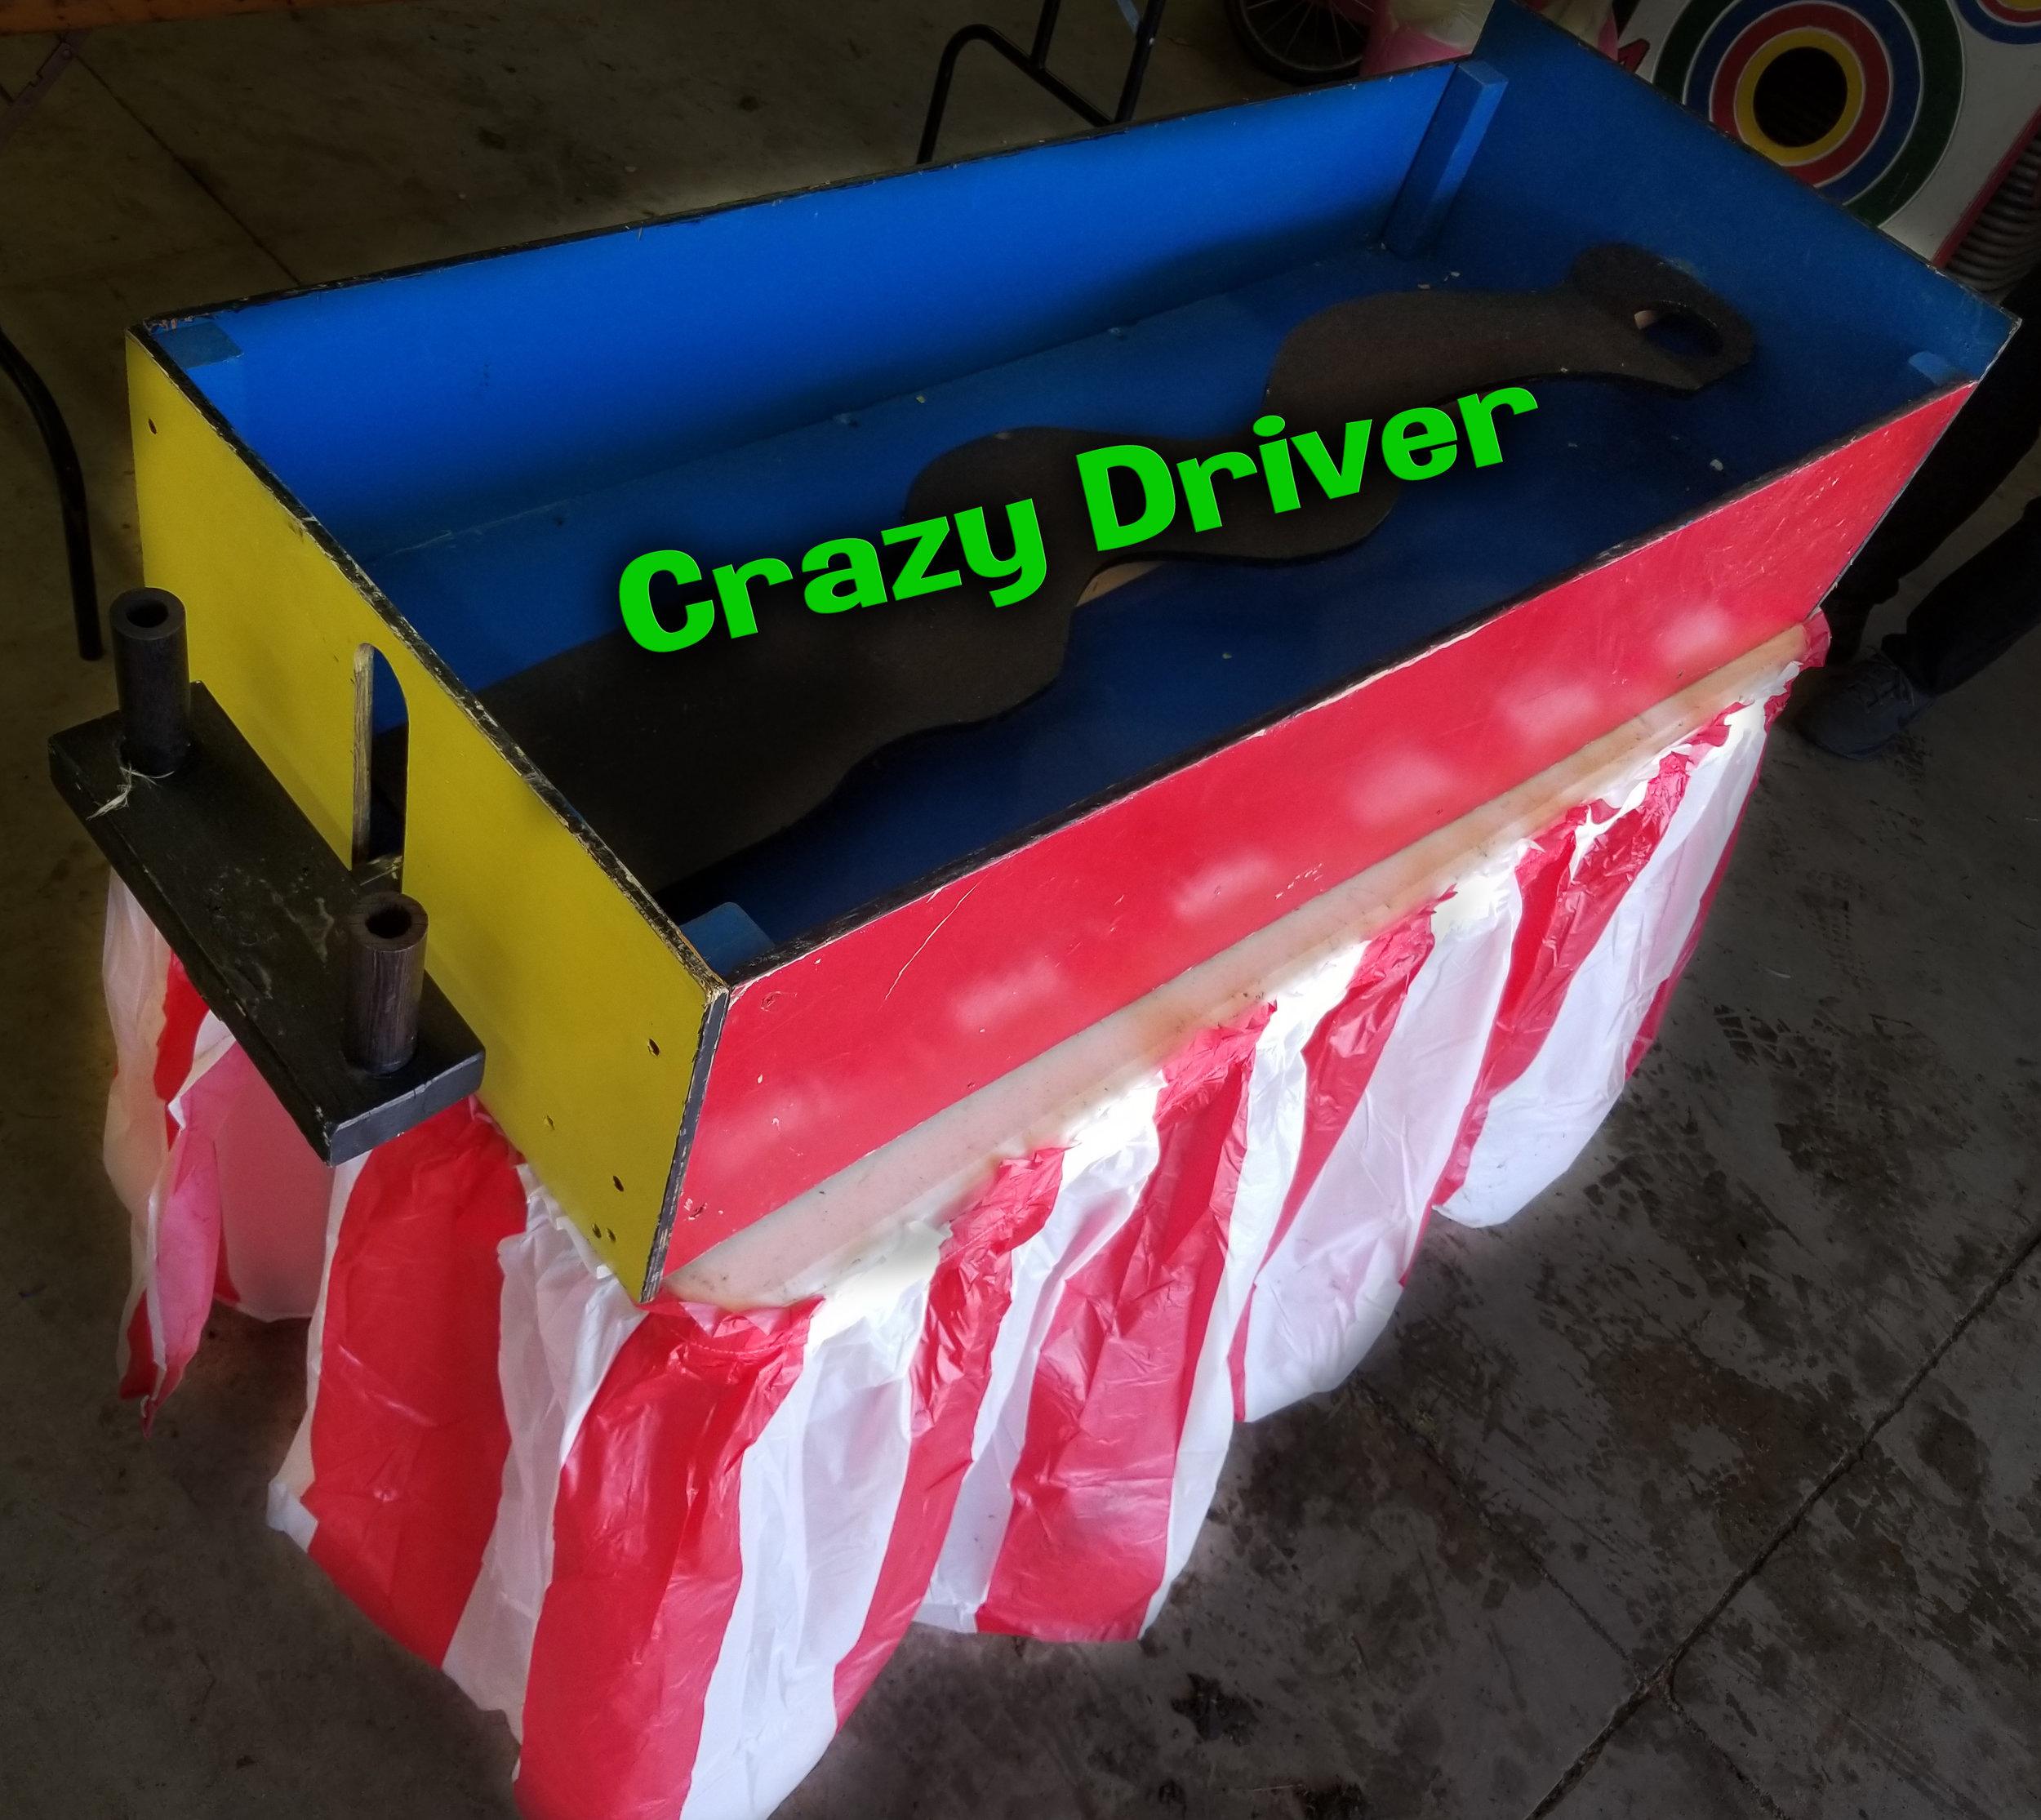 CrazyDriver.jpg